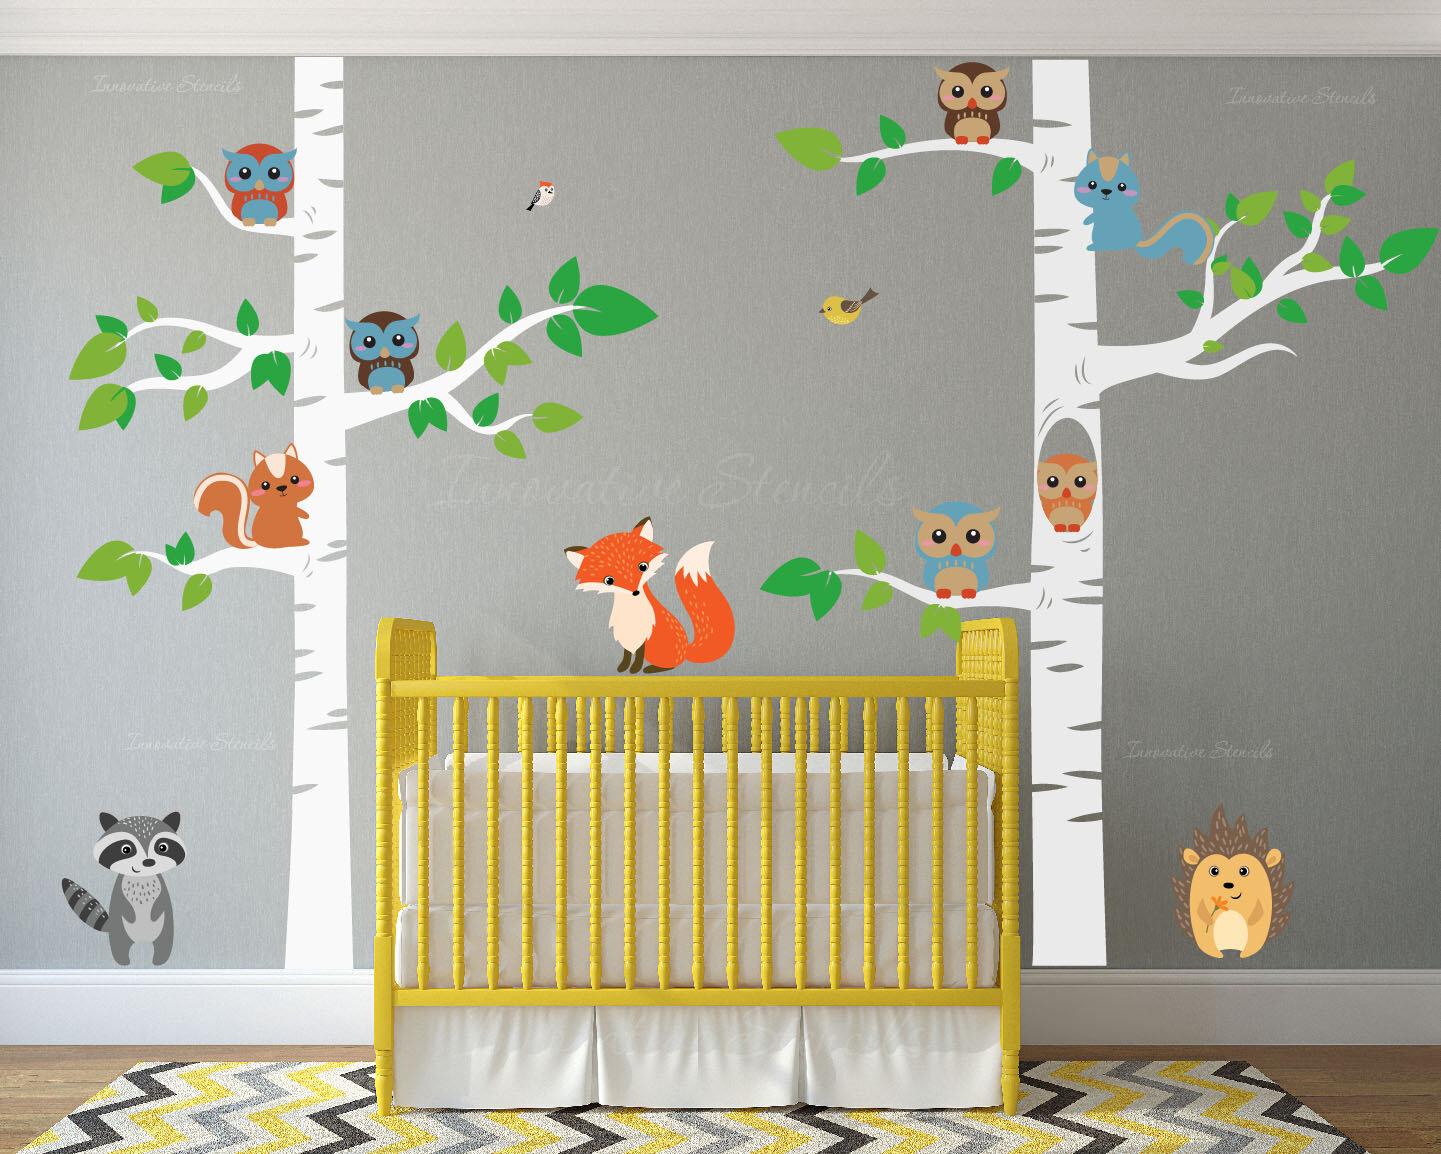 12 Piece Birch Tree Nursery Wall Decal Set Reviews Allmodern